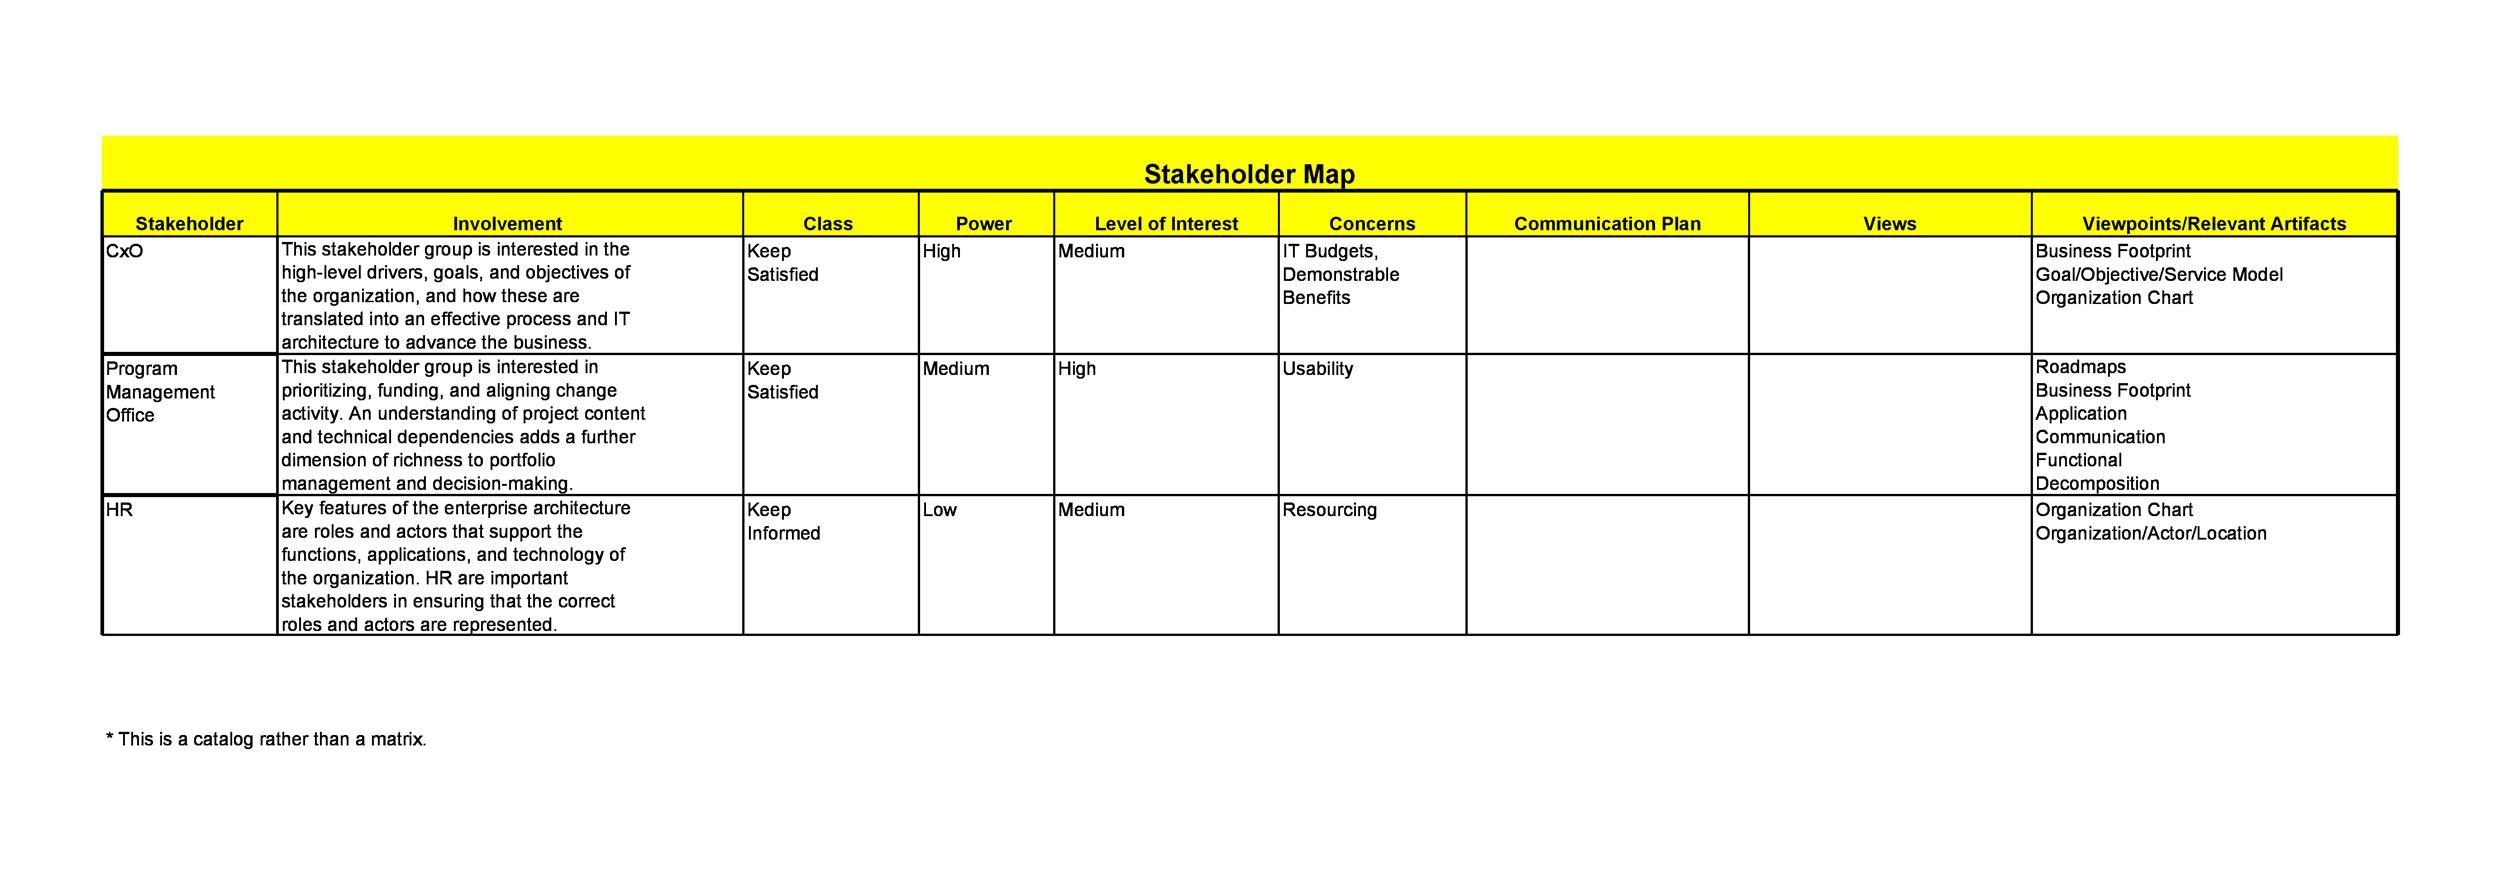 Free stakeholder analysis template 17